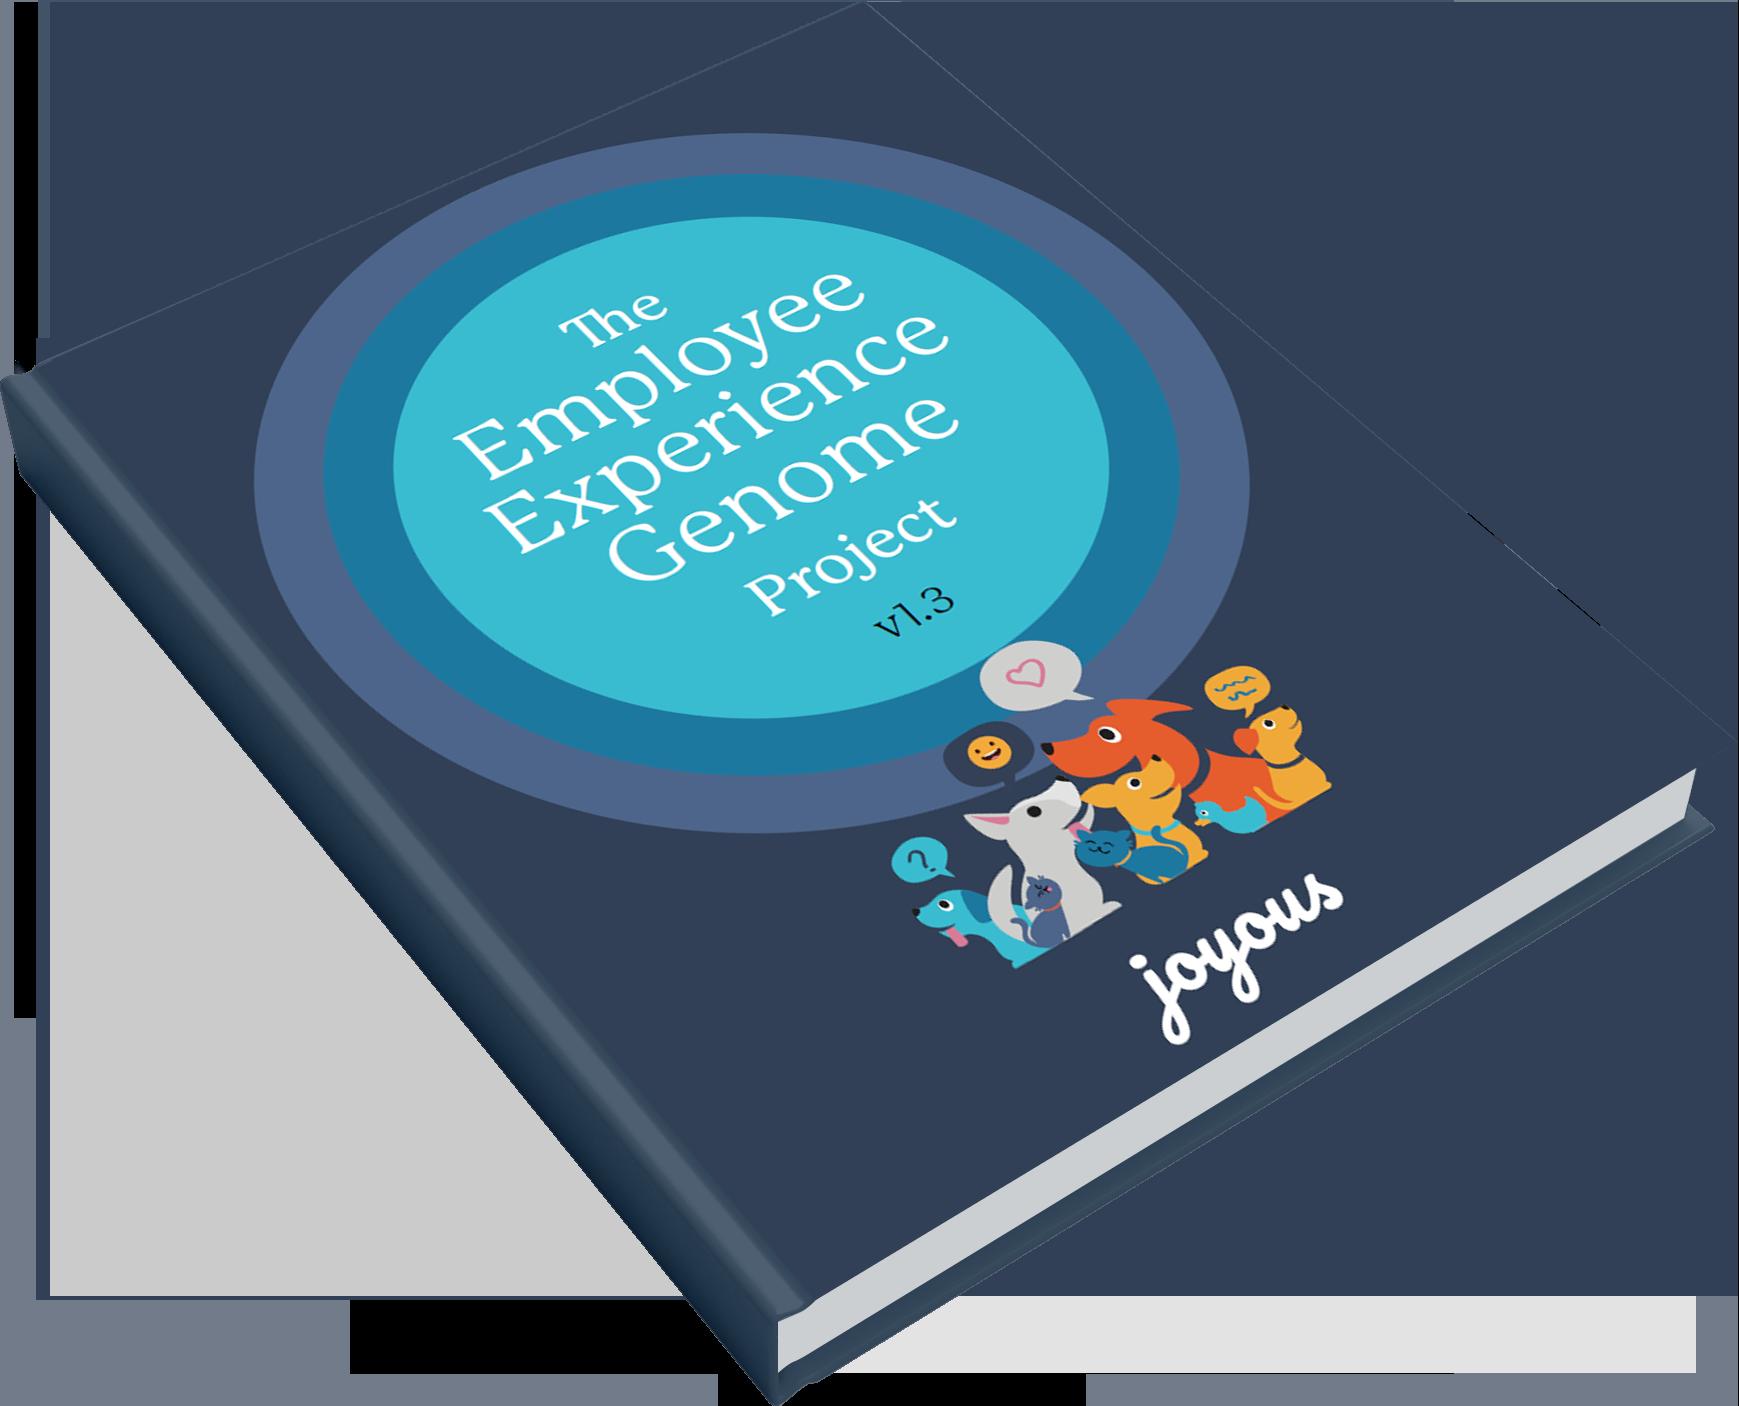 download-exgenome-book